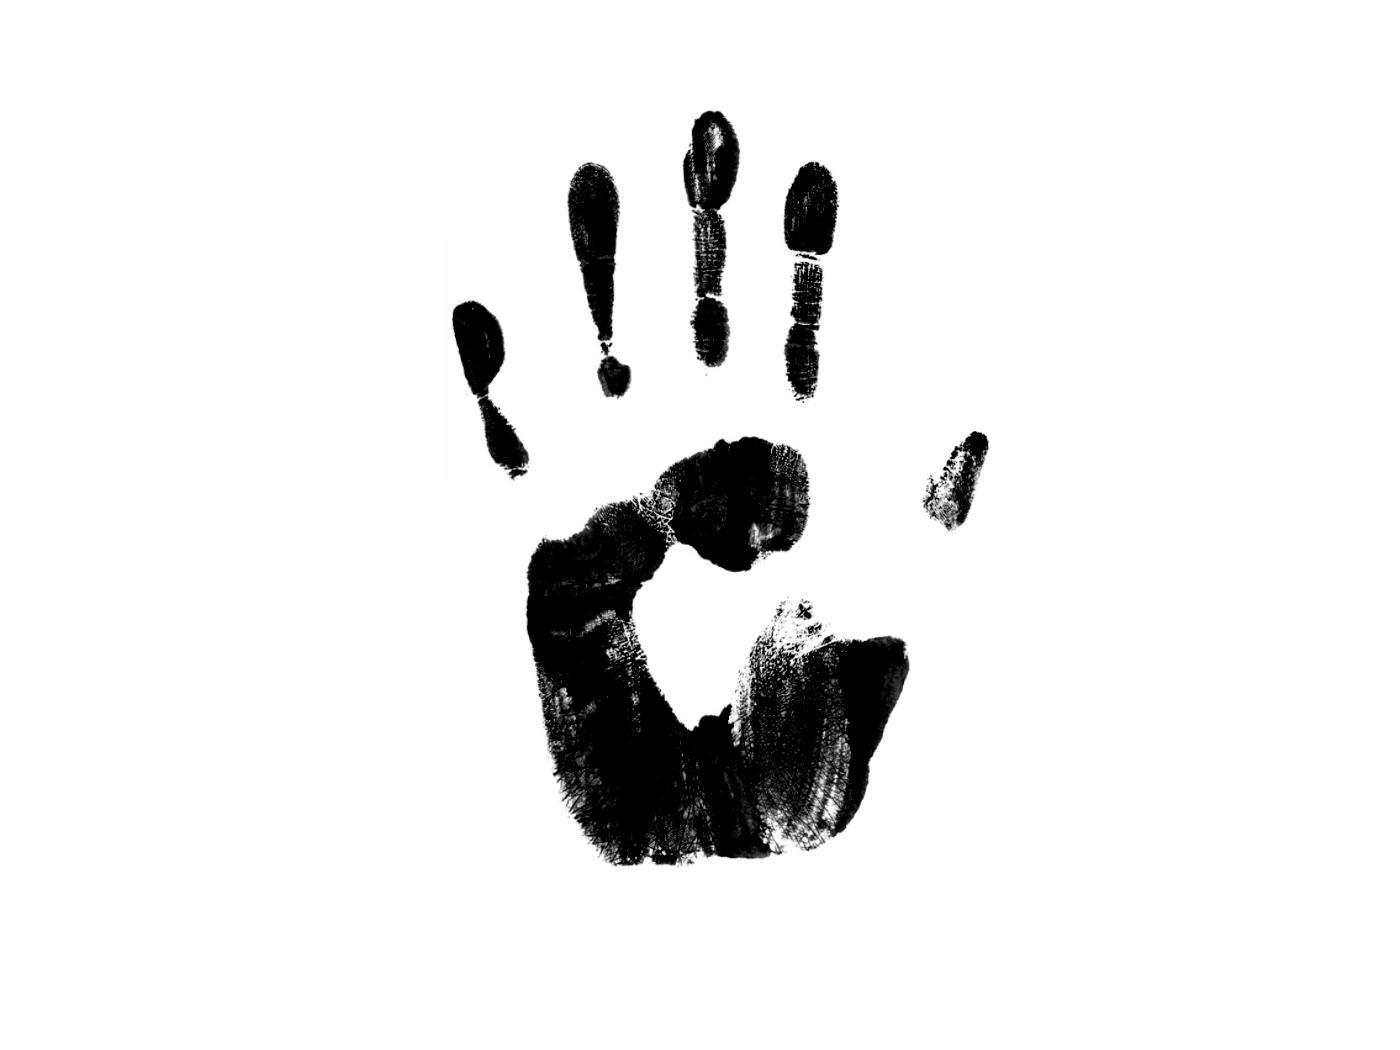 Handprint clipart left right Suggest Left Print Hand Print